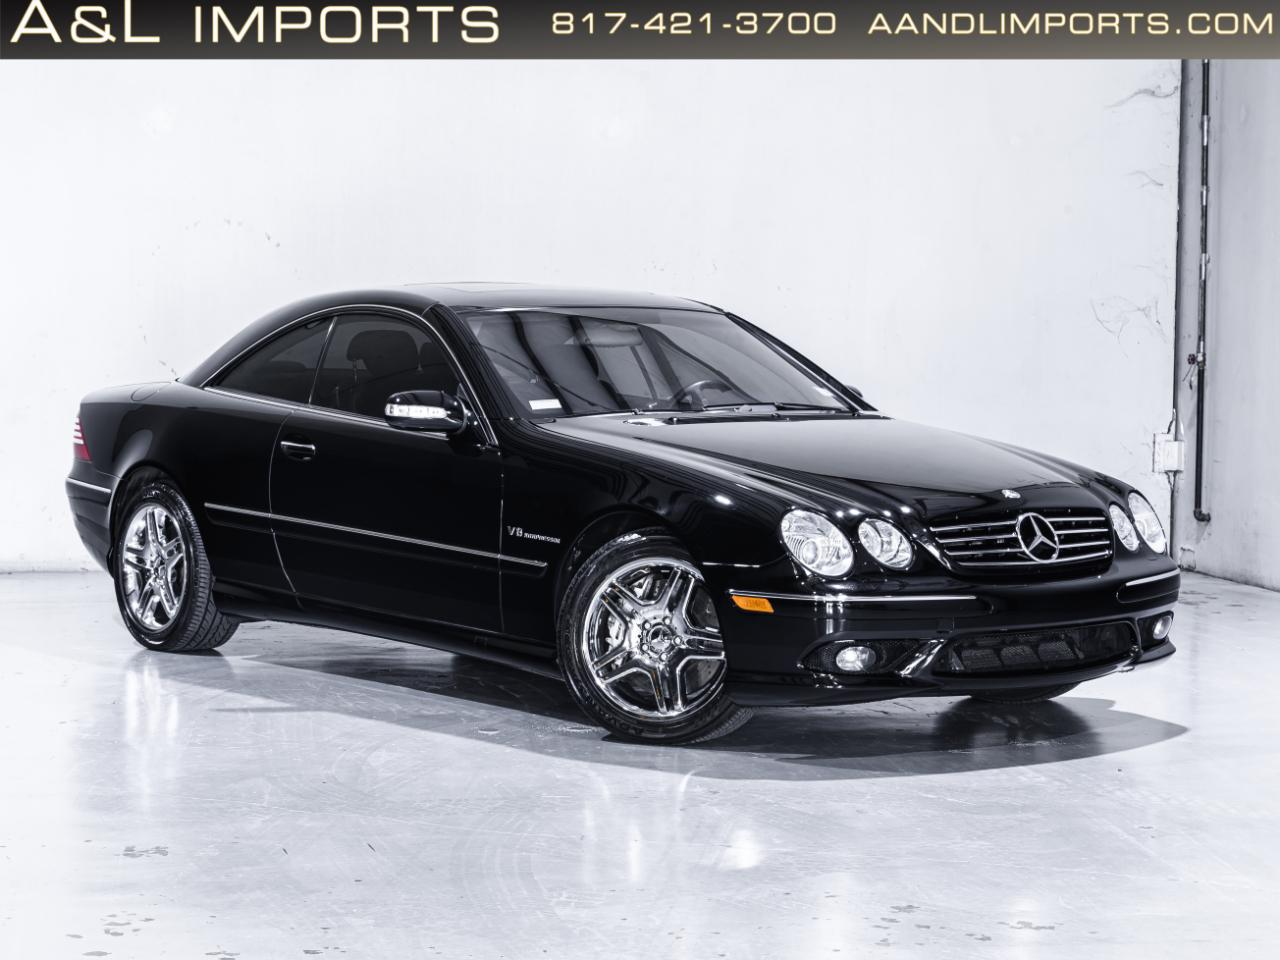 Mercedes-Benz CL-Class 2dr Cpe 5.5L AMG 2003